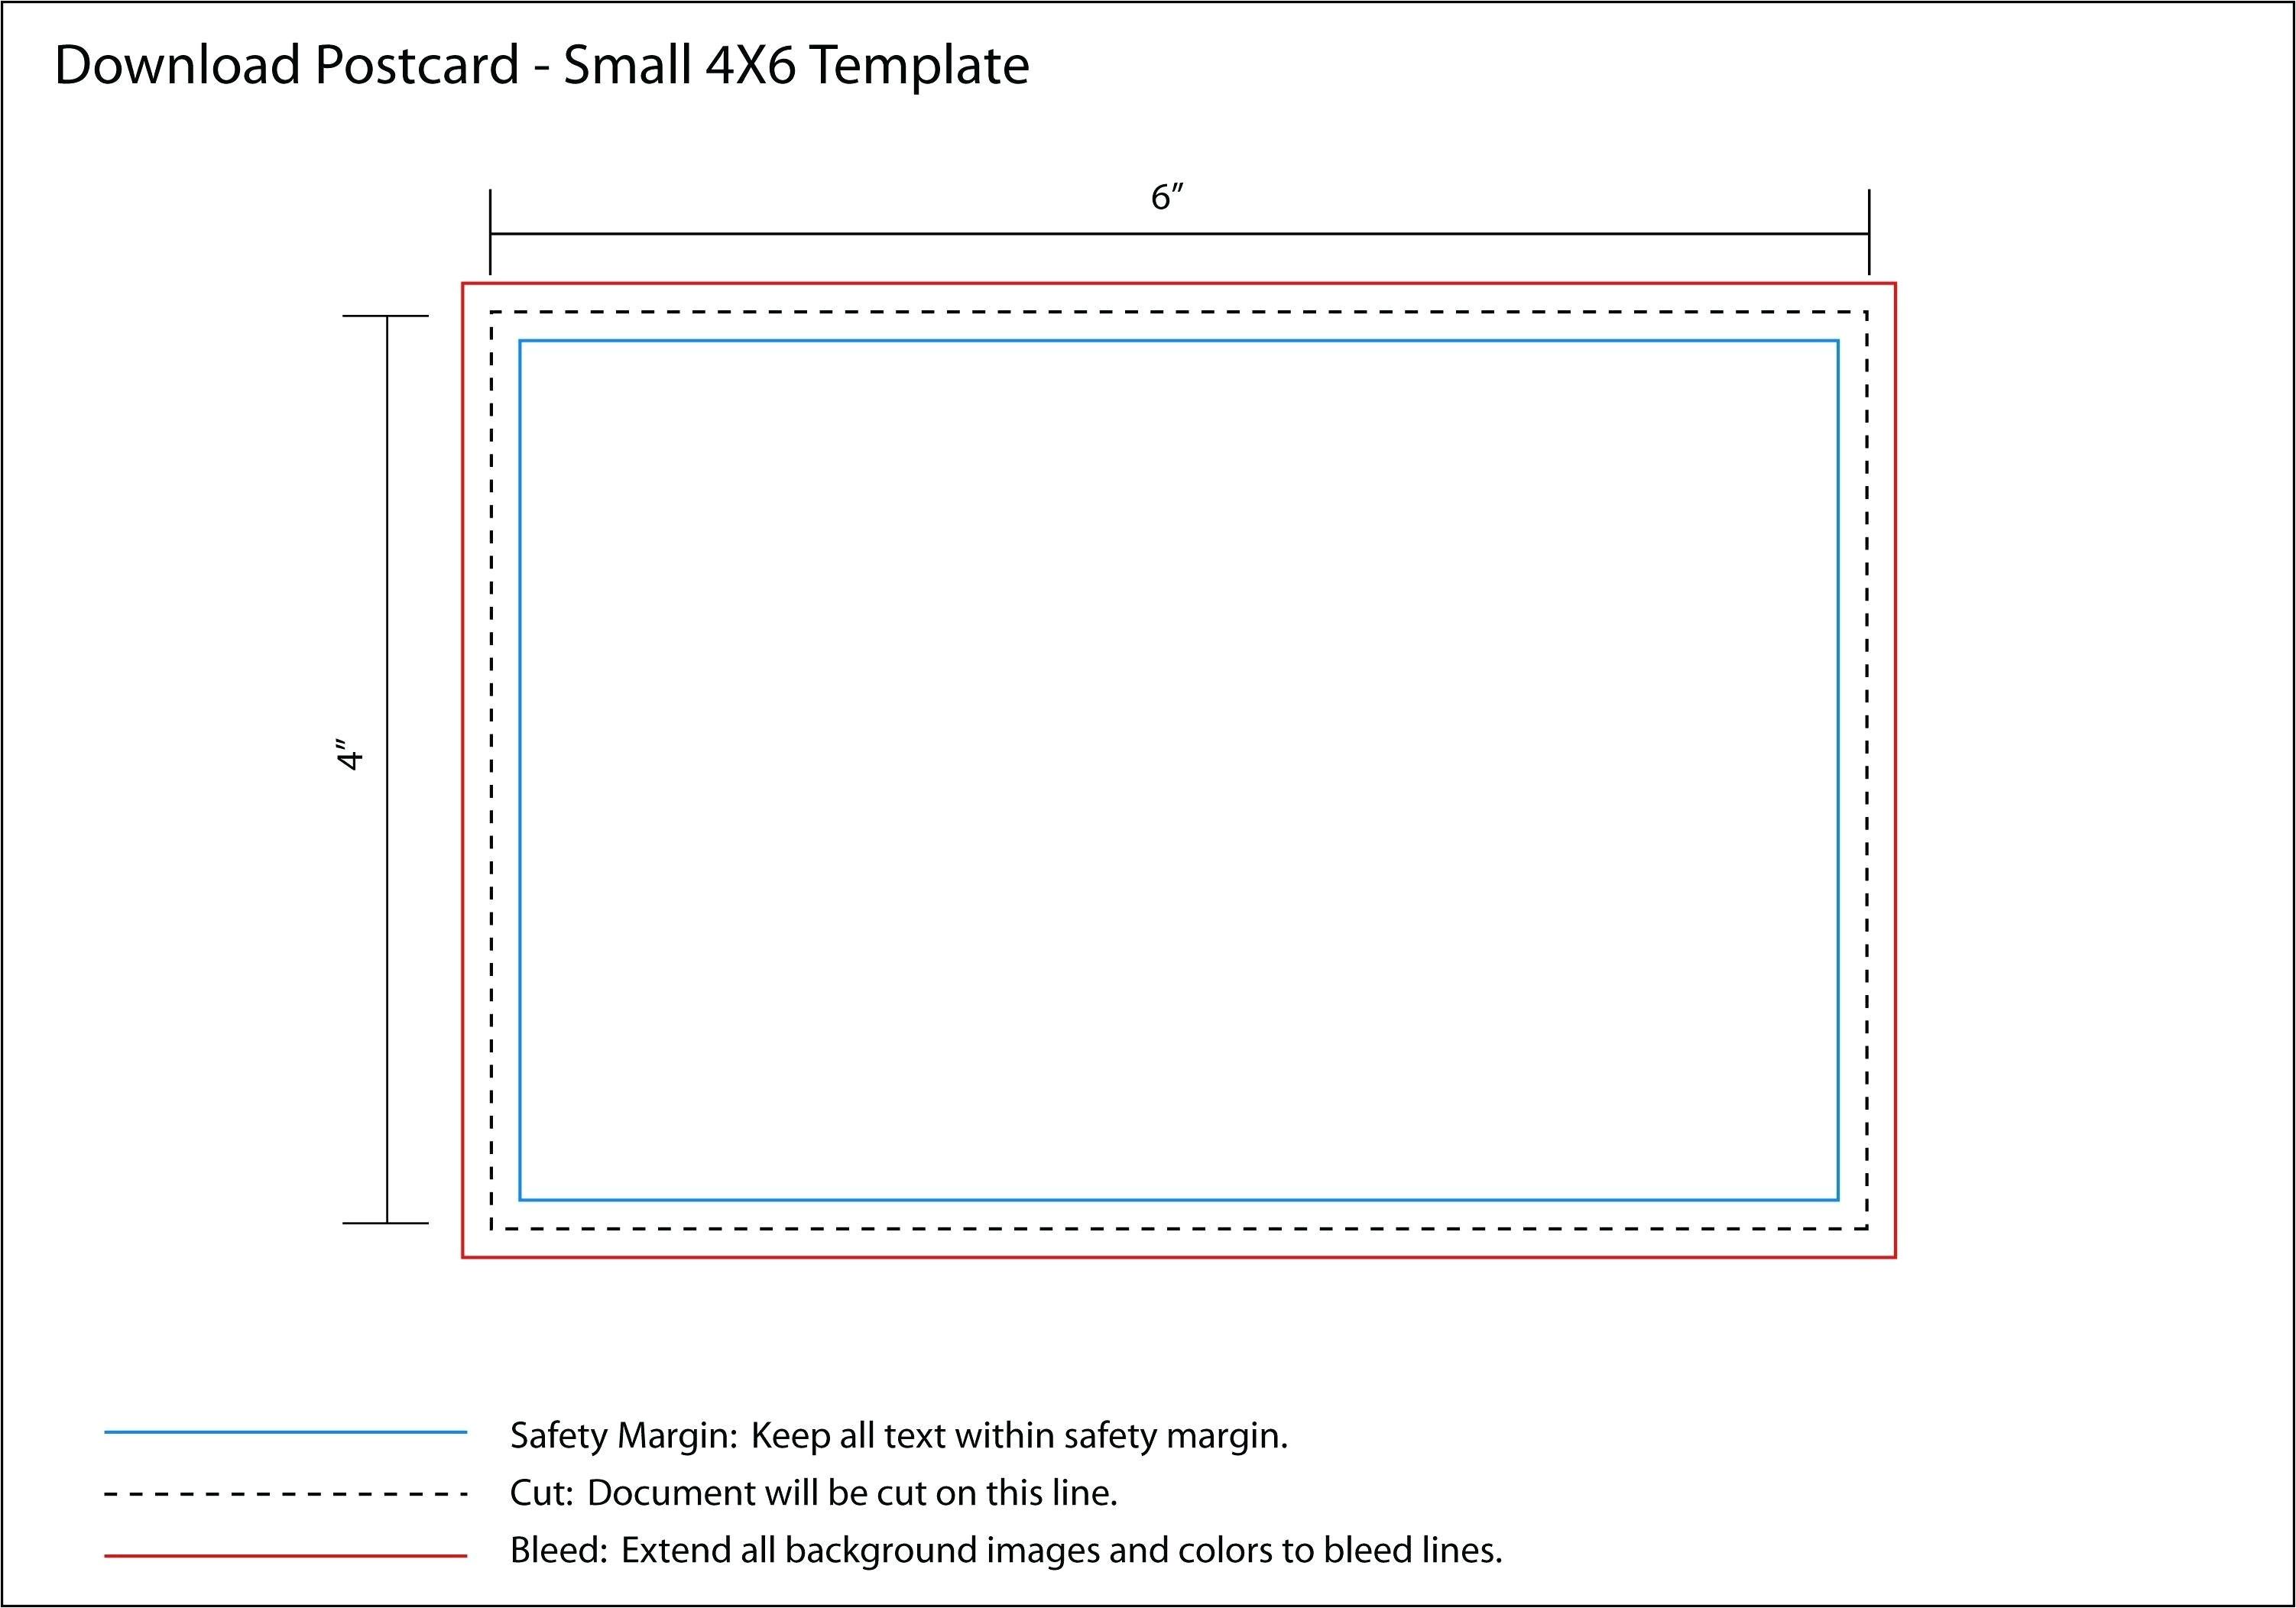 4x6 photo card template free